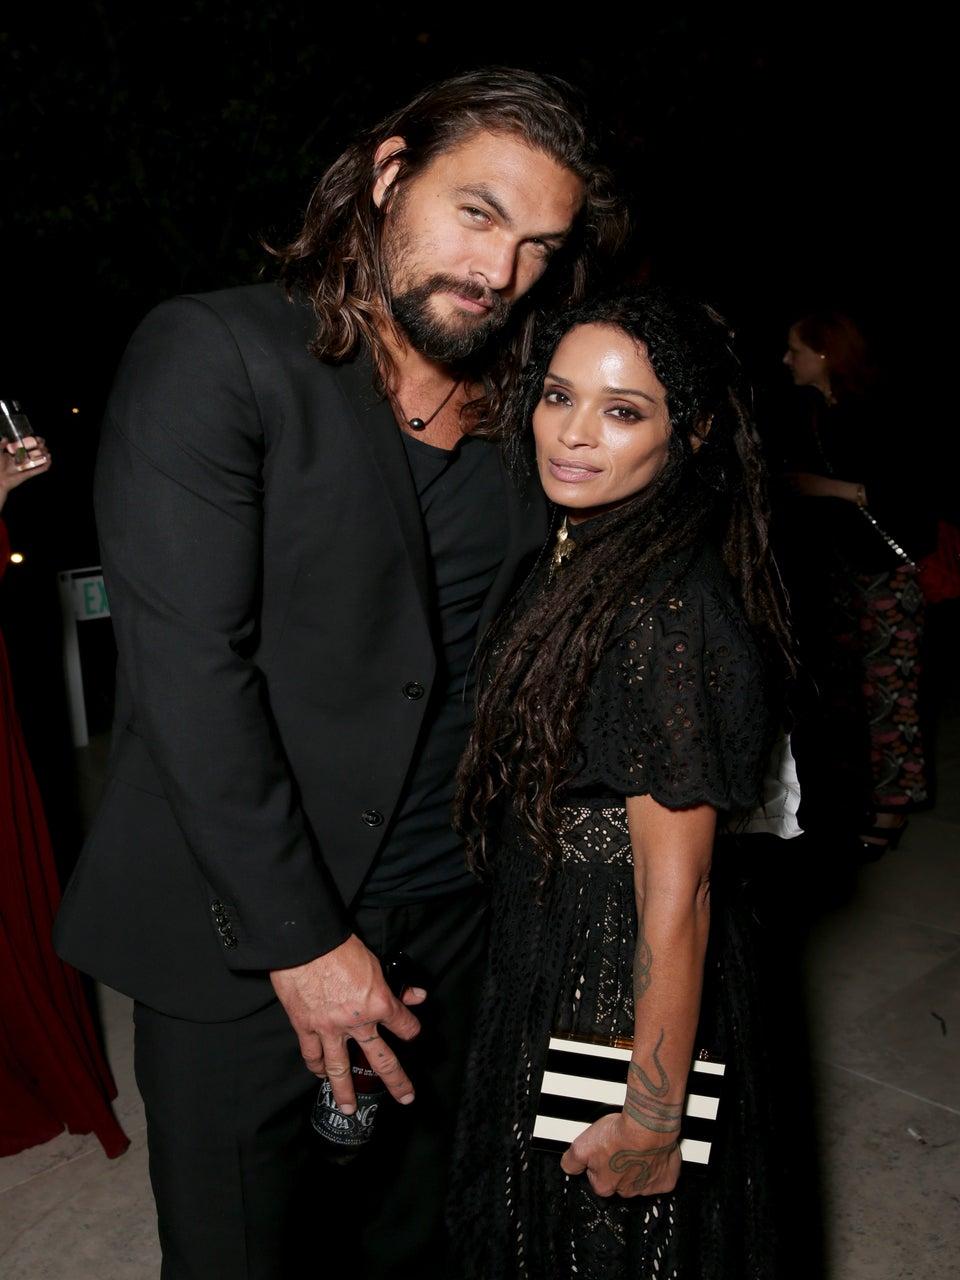 Lisa Bonet Surprises Husband Jason Momoa On Set For His Birthday